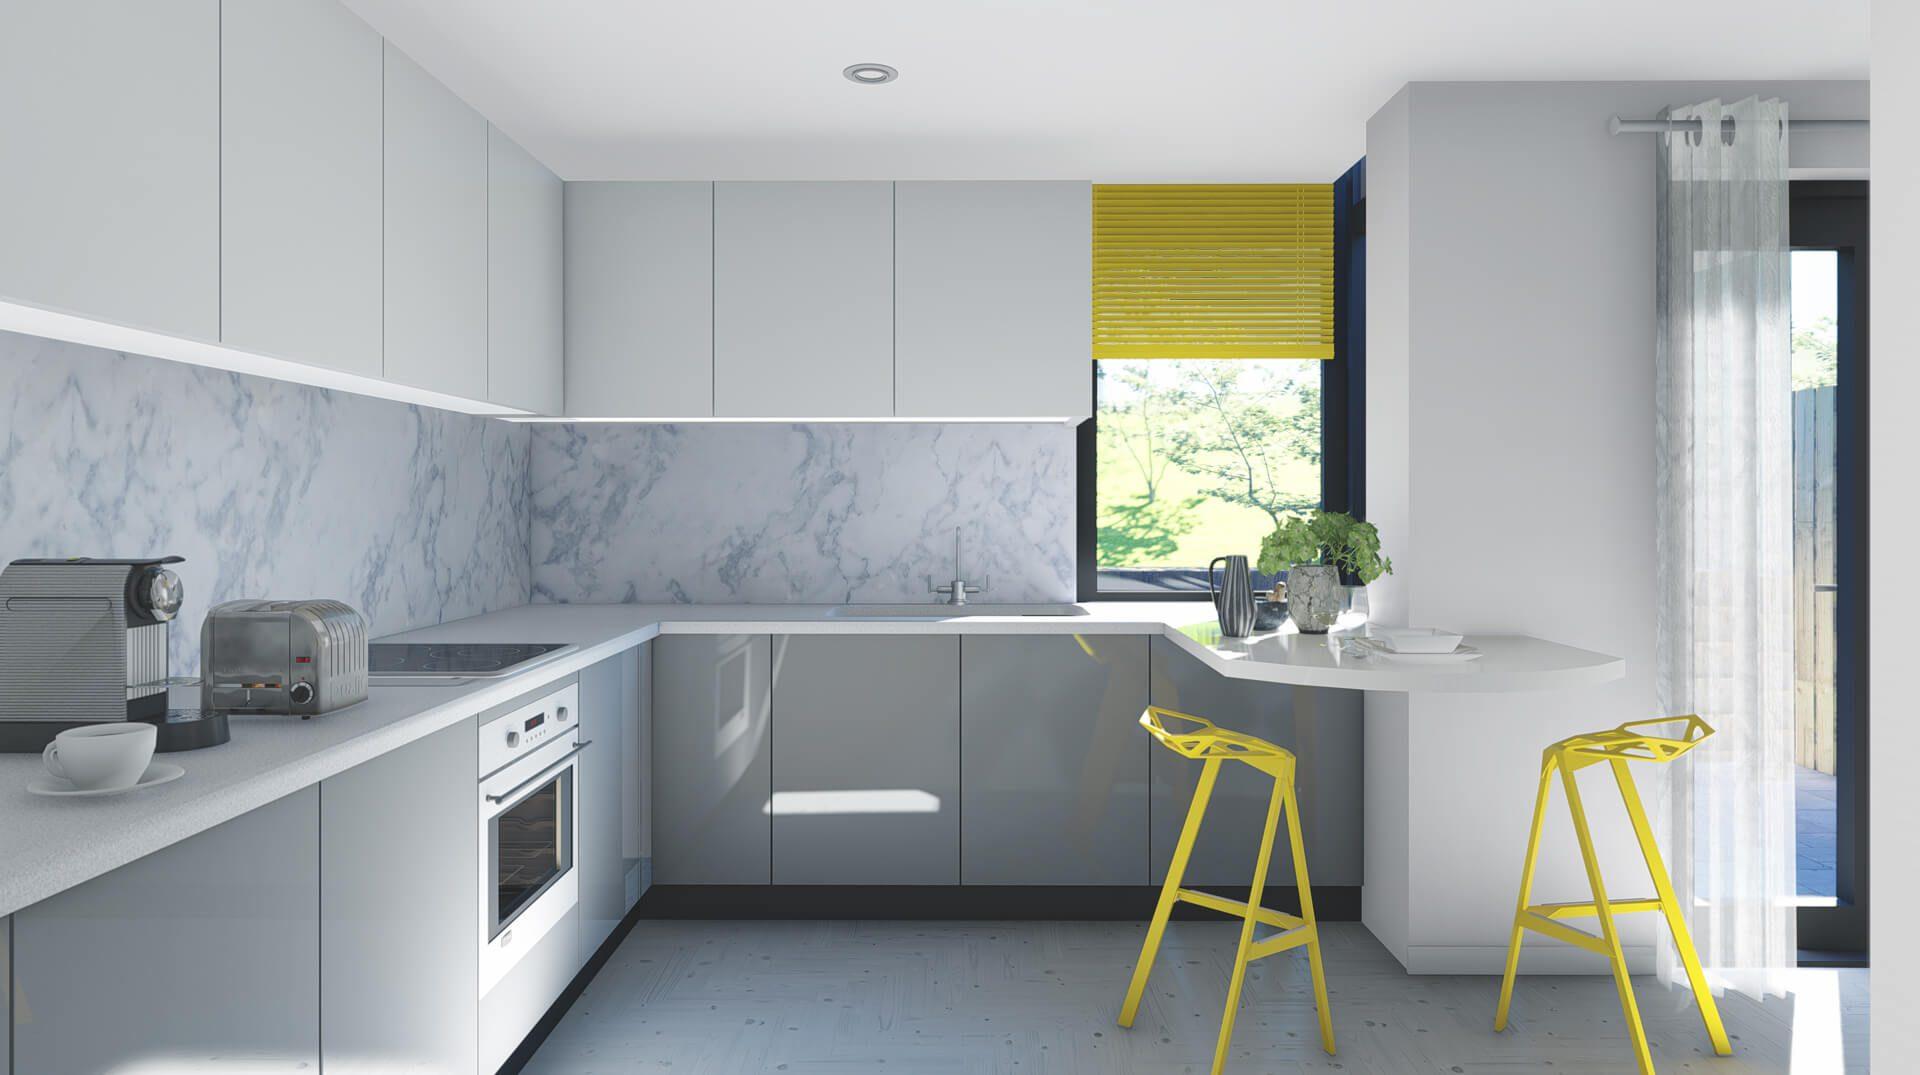 CGI of the kitchen at the Hive development.